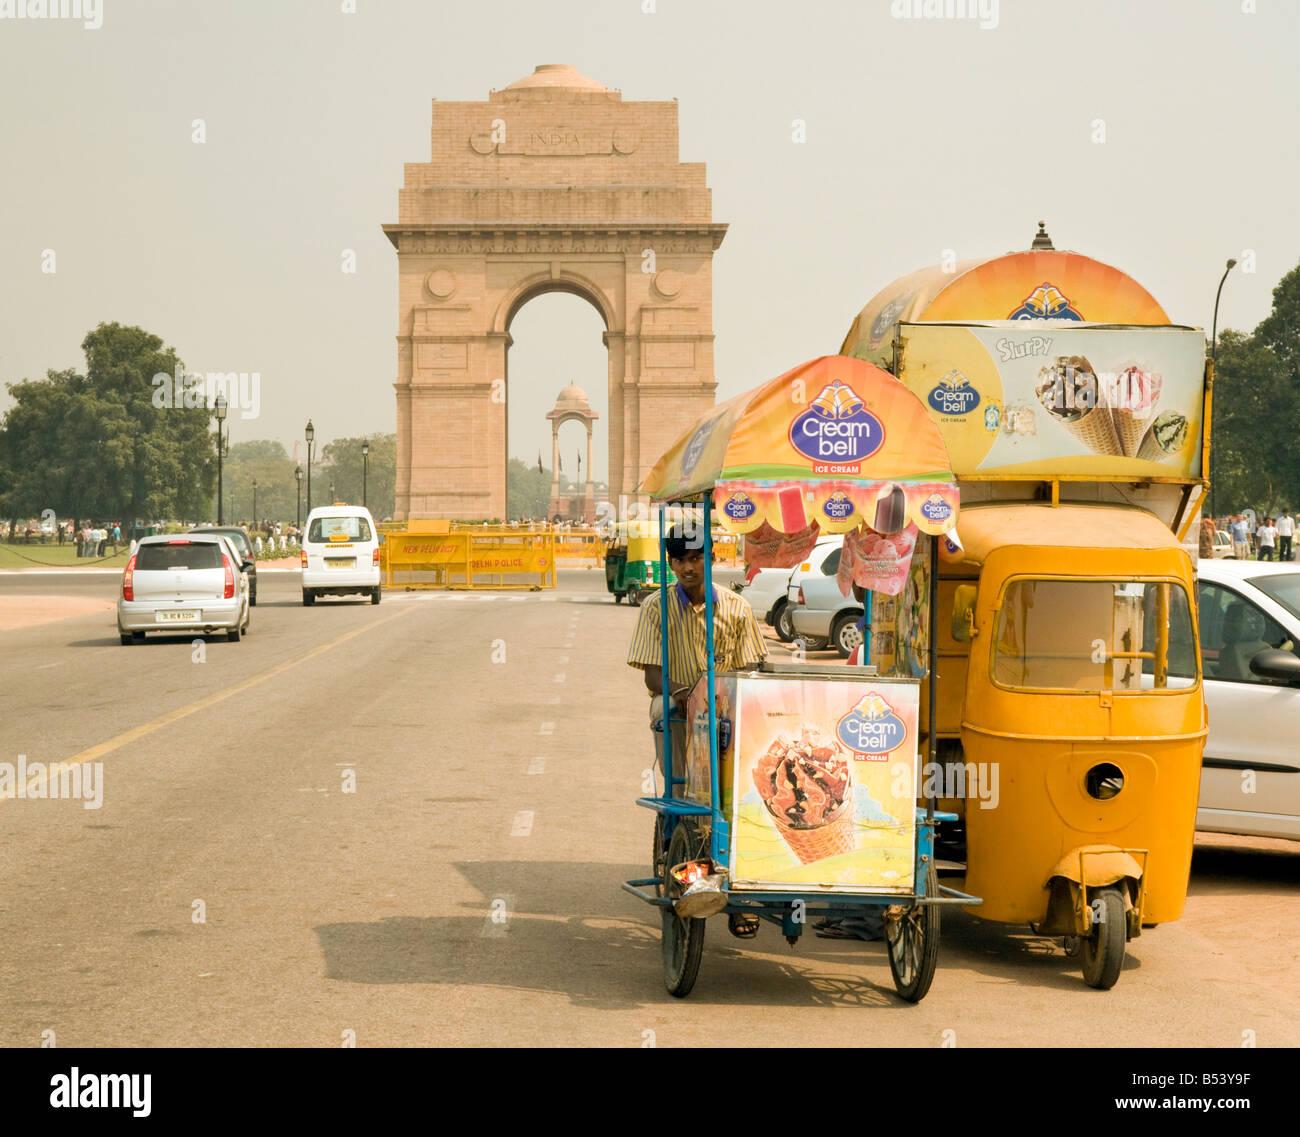 Ice cream men and their vans, India Gate, New Delhi, India - Stock Image